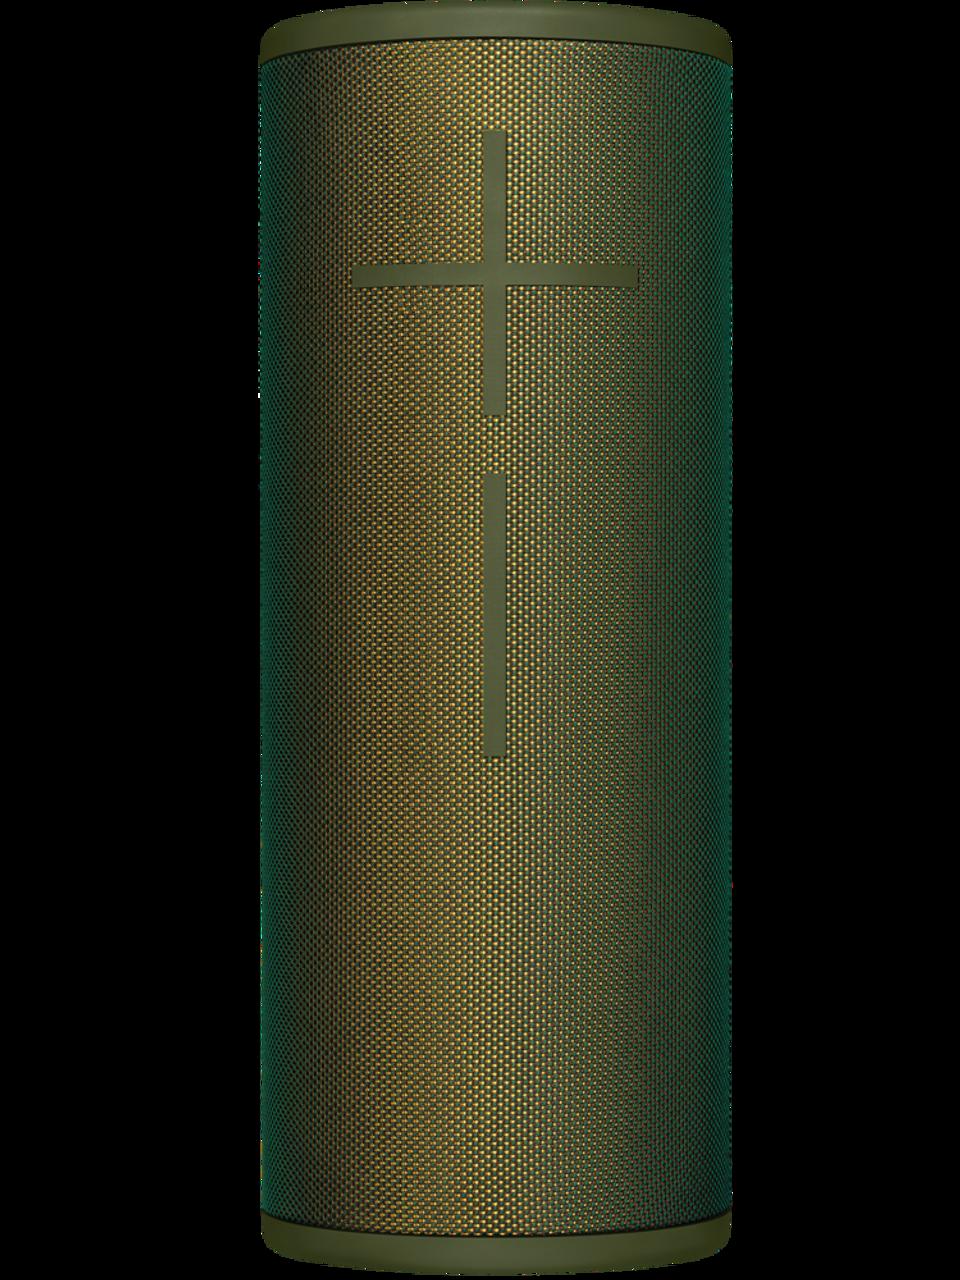 Ultimate Ears Megaboom 3 - Forest Green